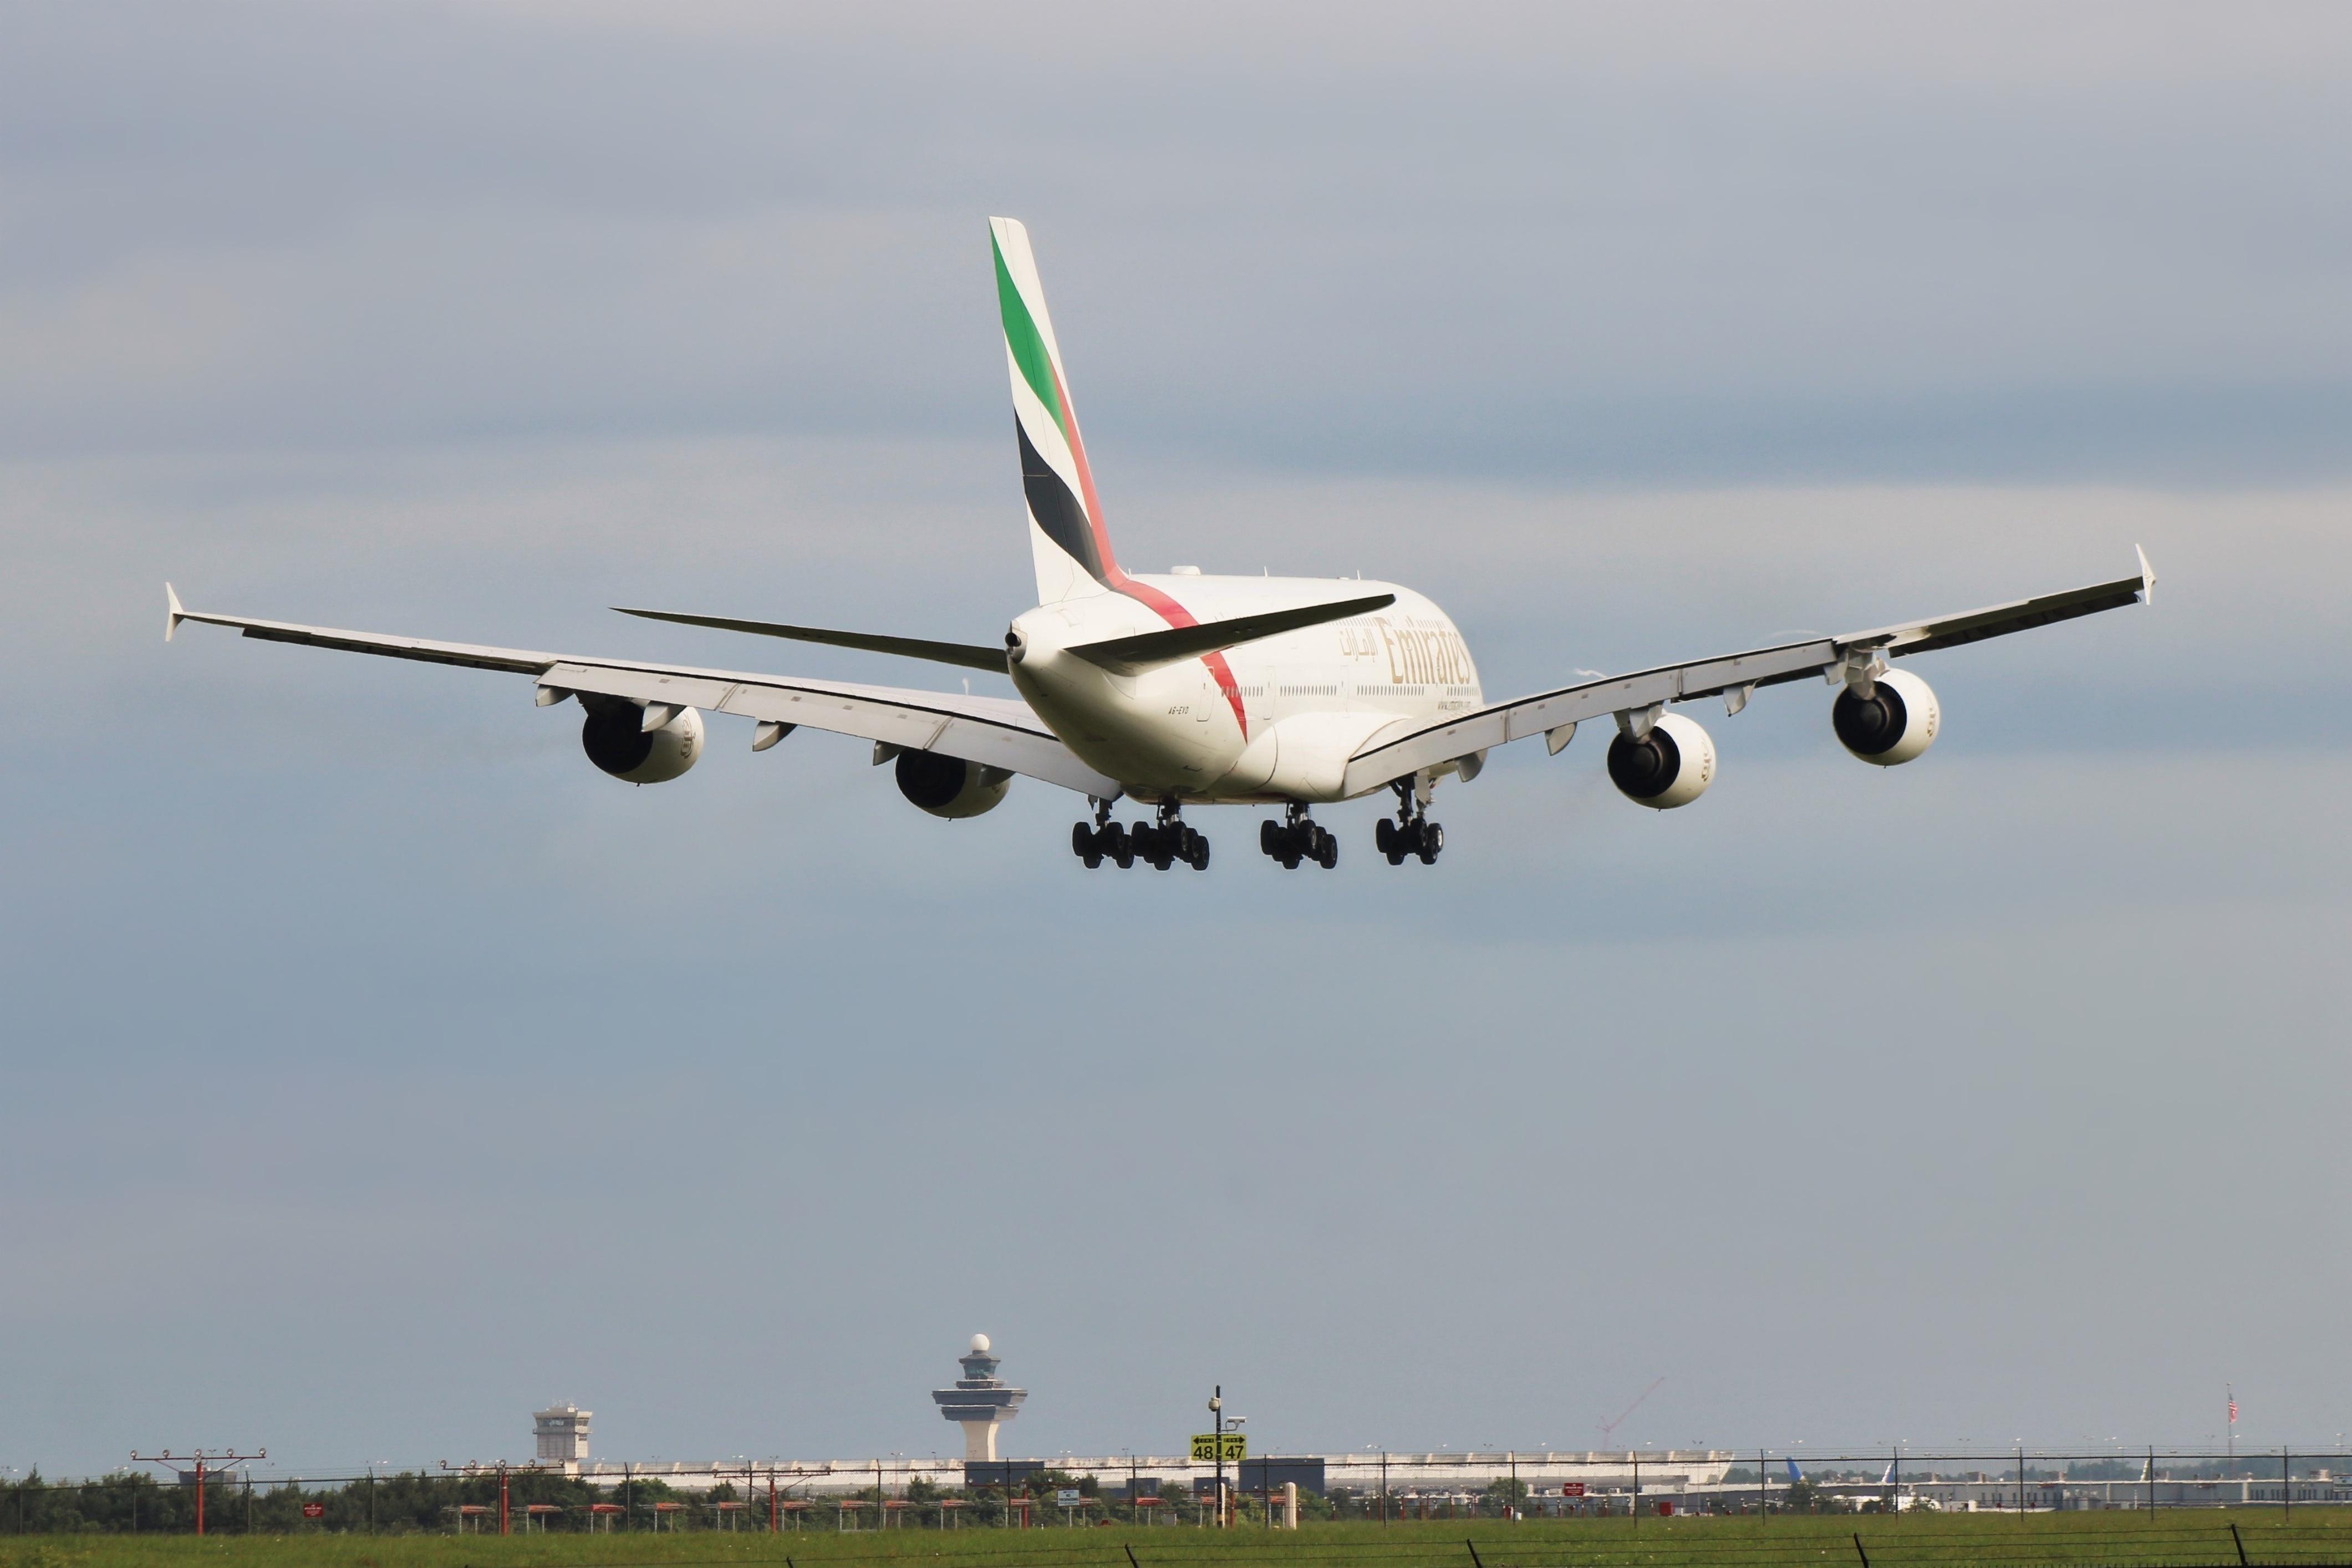 Photo of A6-EVD - Emirates Airbus A380-800 at IAD